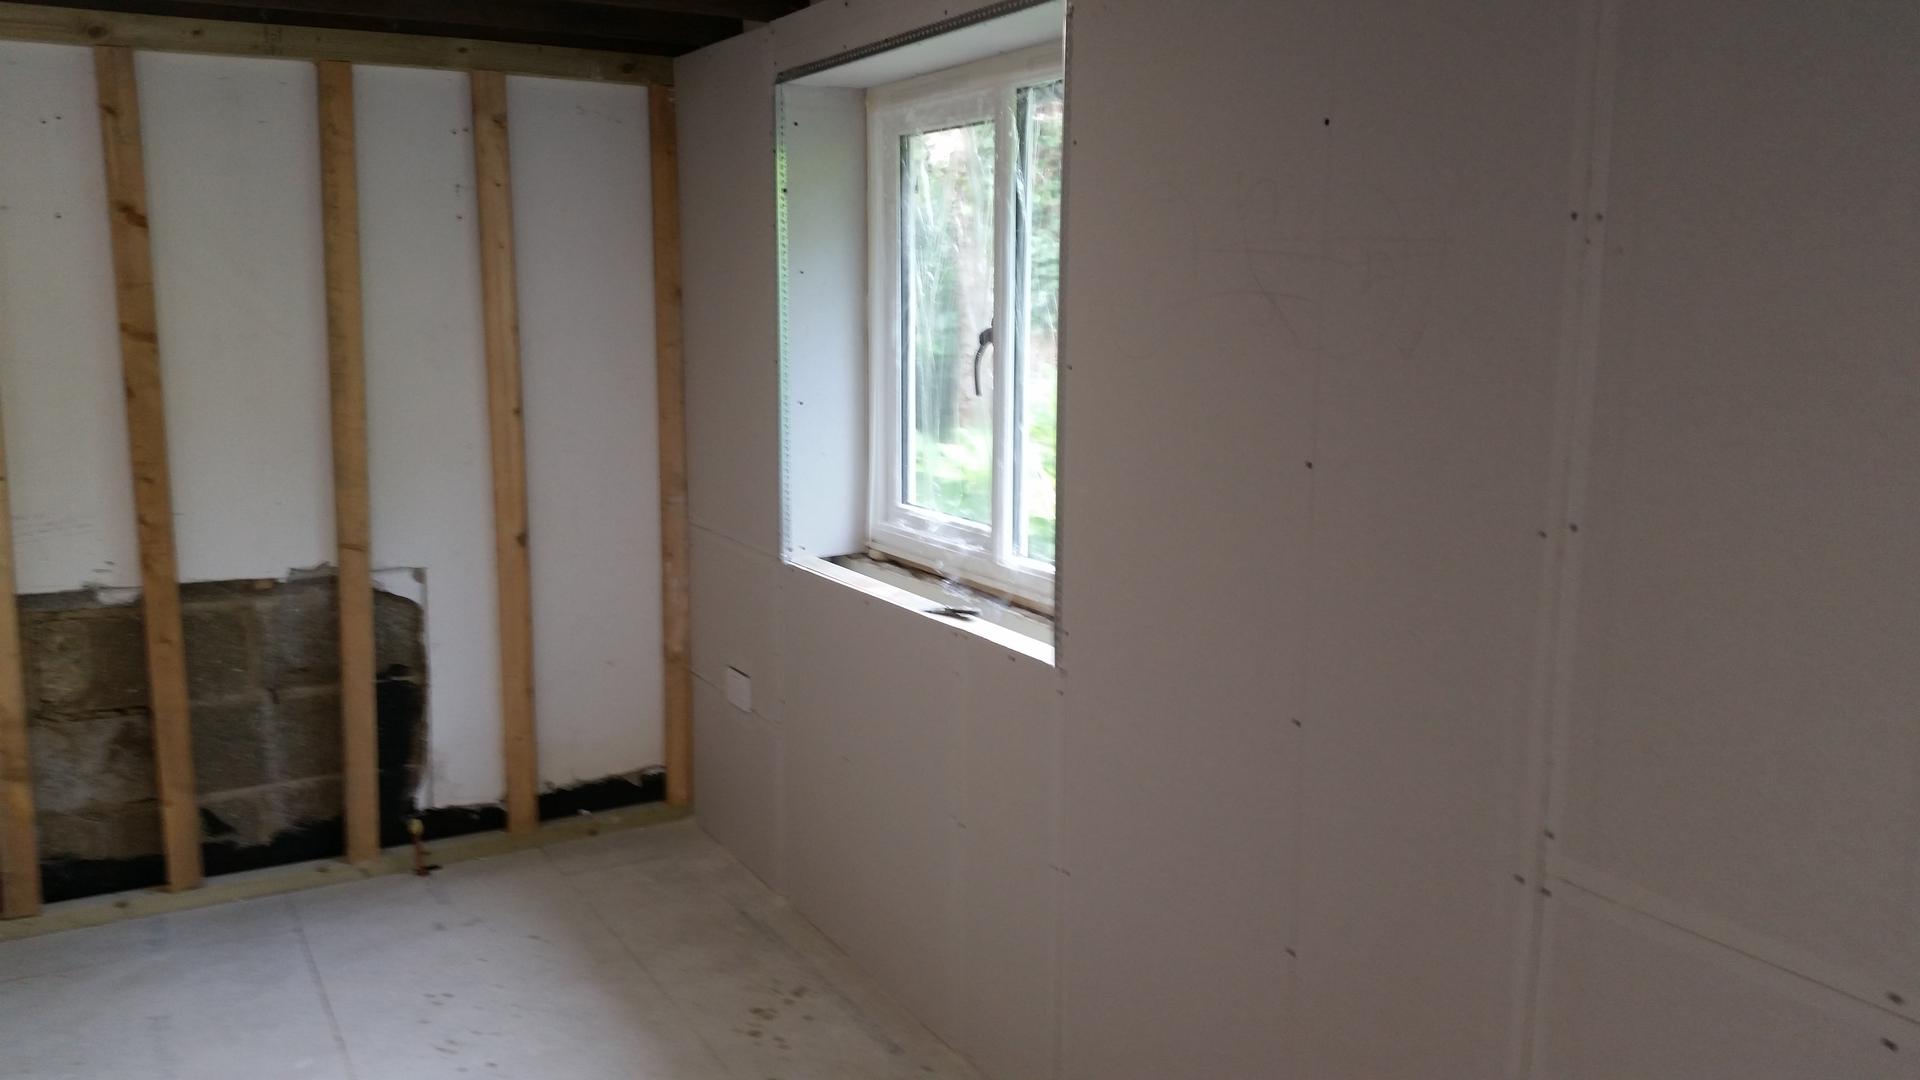 Plastering in Maidstone Kent Plasterer Heritage Plastering & Conversions Ltd